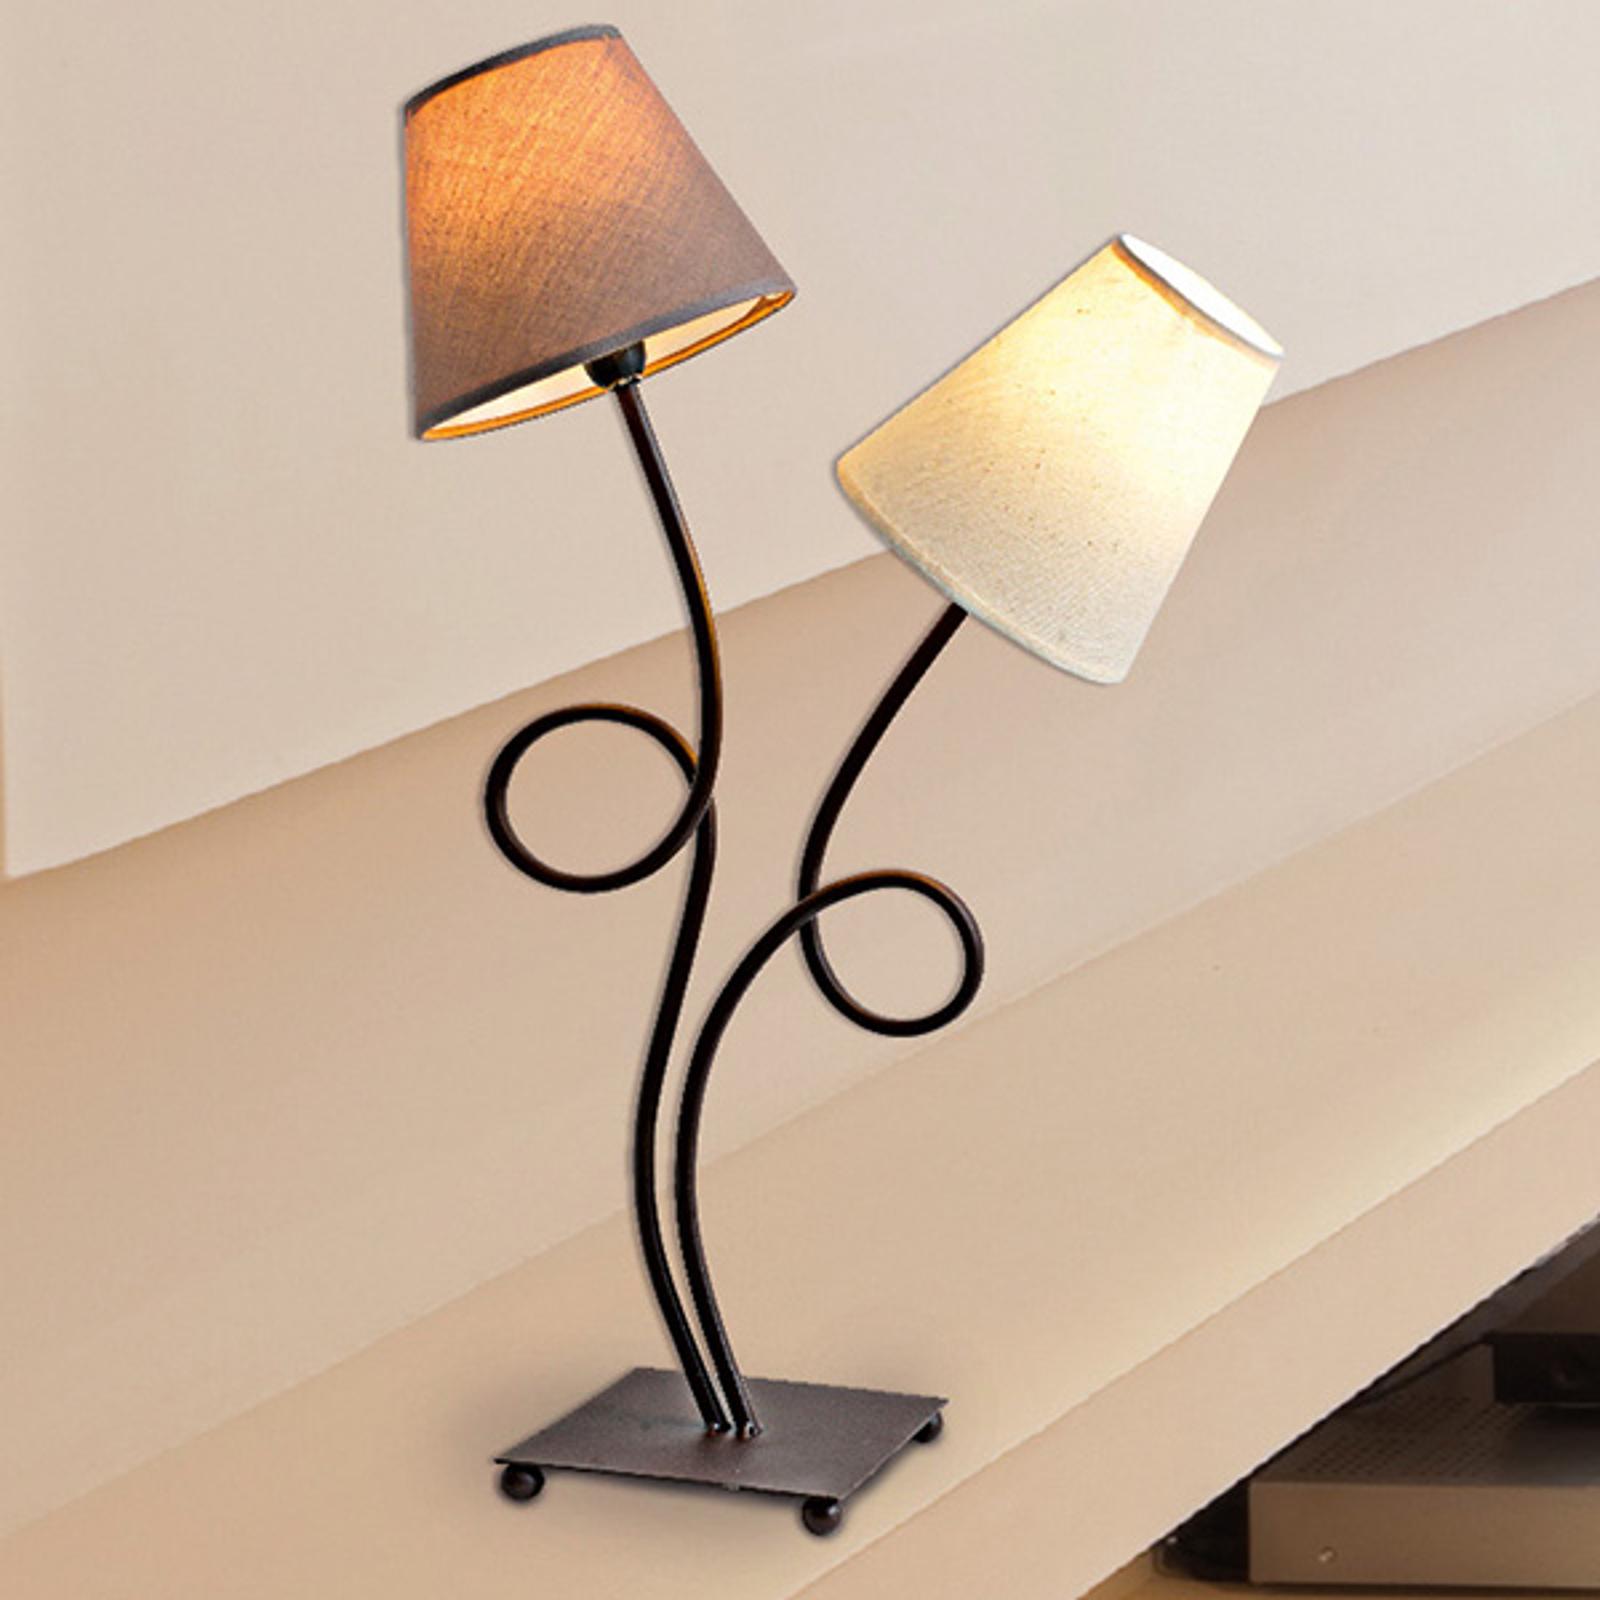 Tweeflammige stoffen tafellamp Twiddle